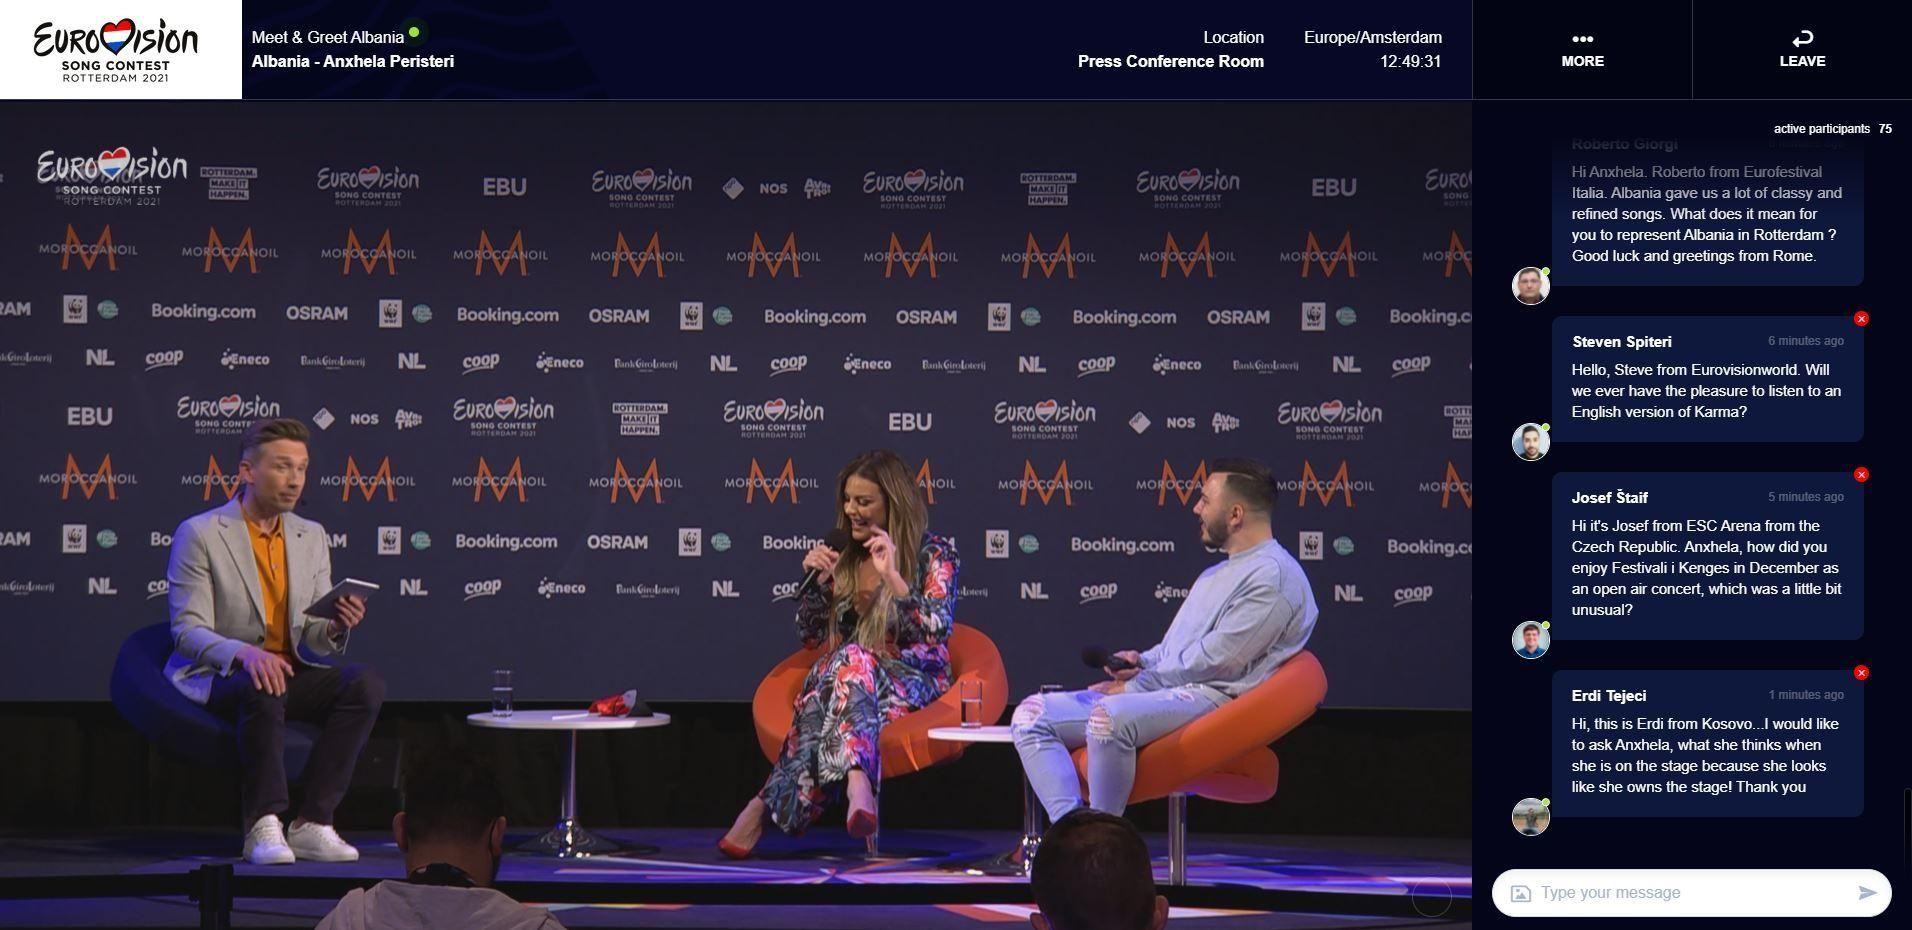 Eurovisie Songfestival virtual pressroom 2021